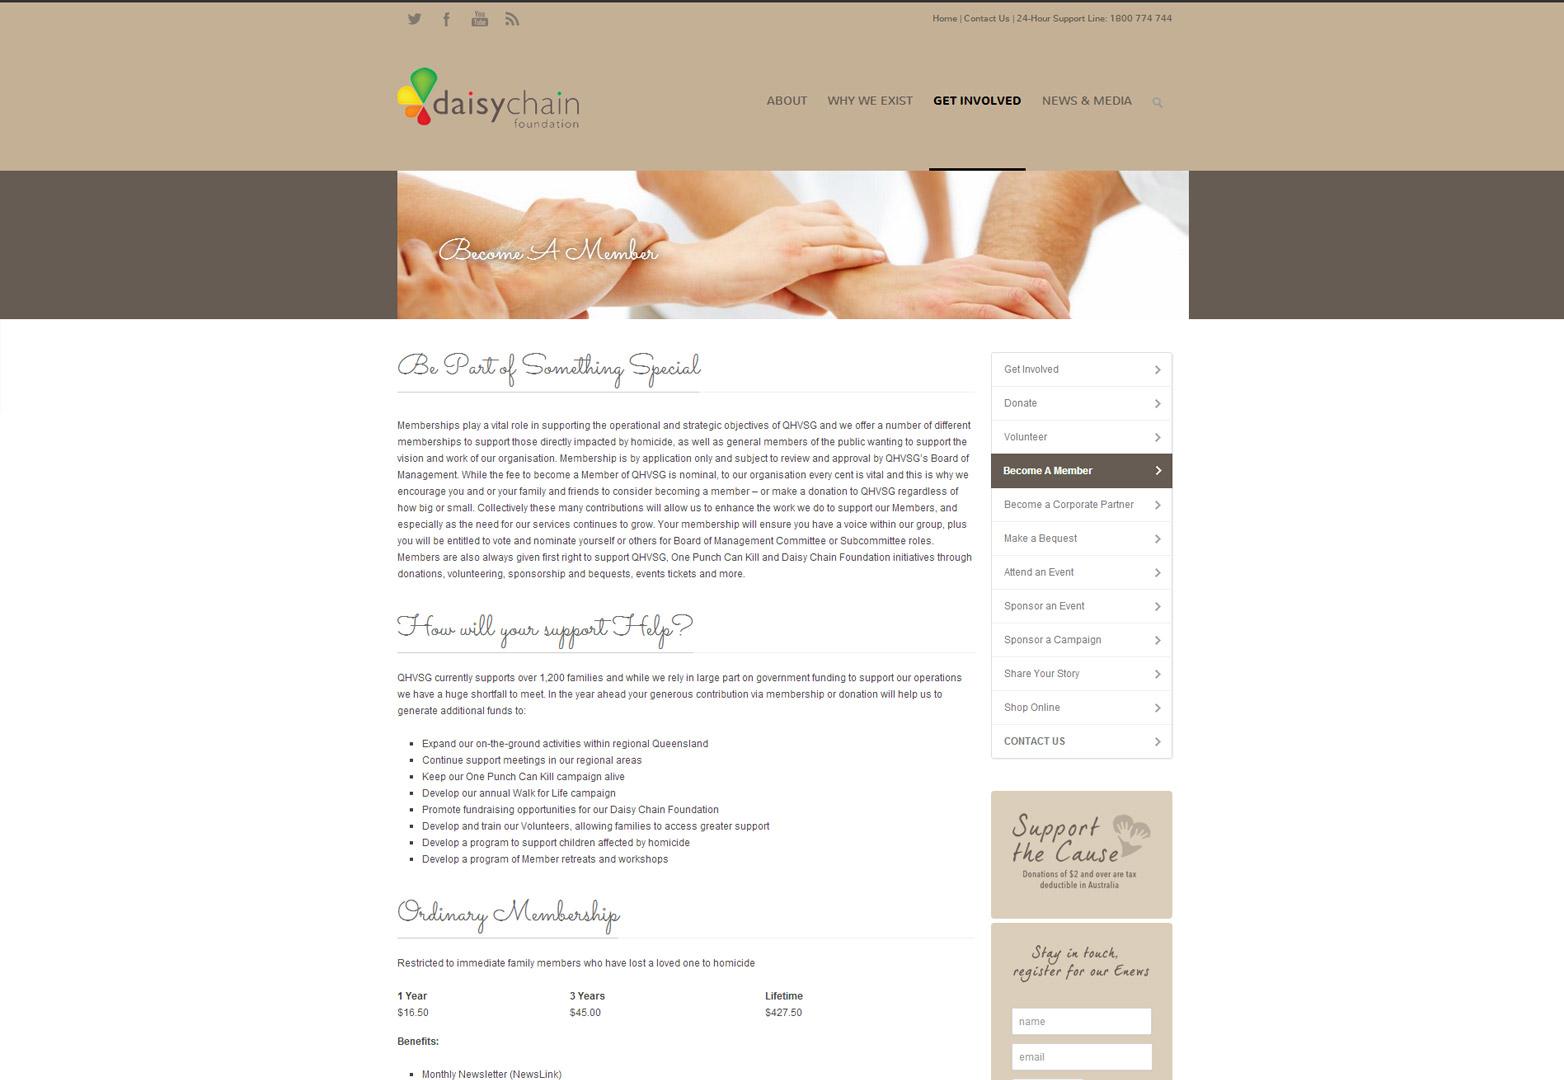 Daisychain Foundation